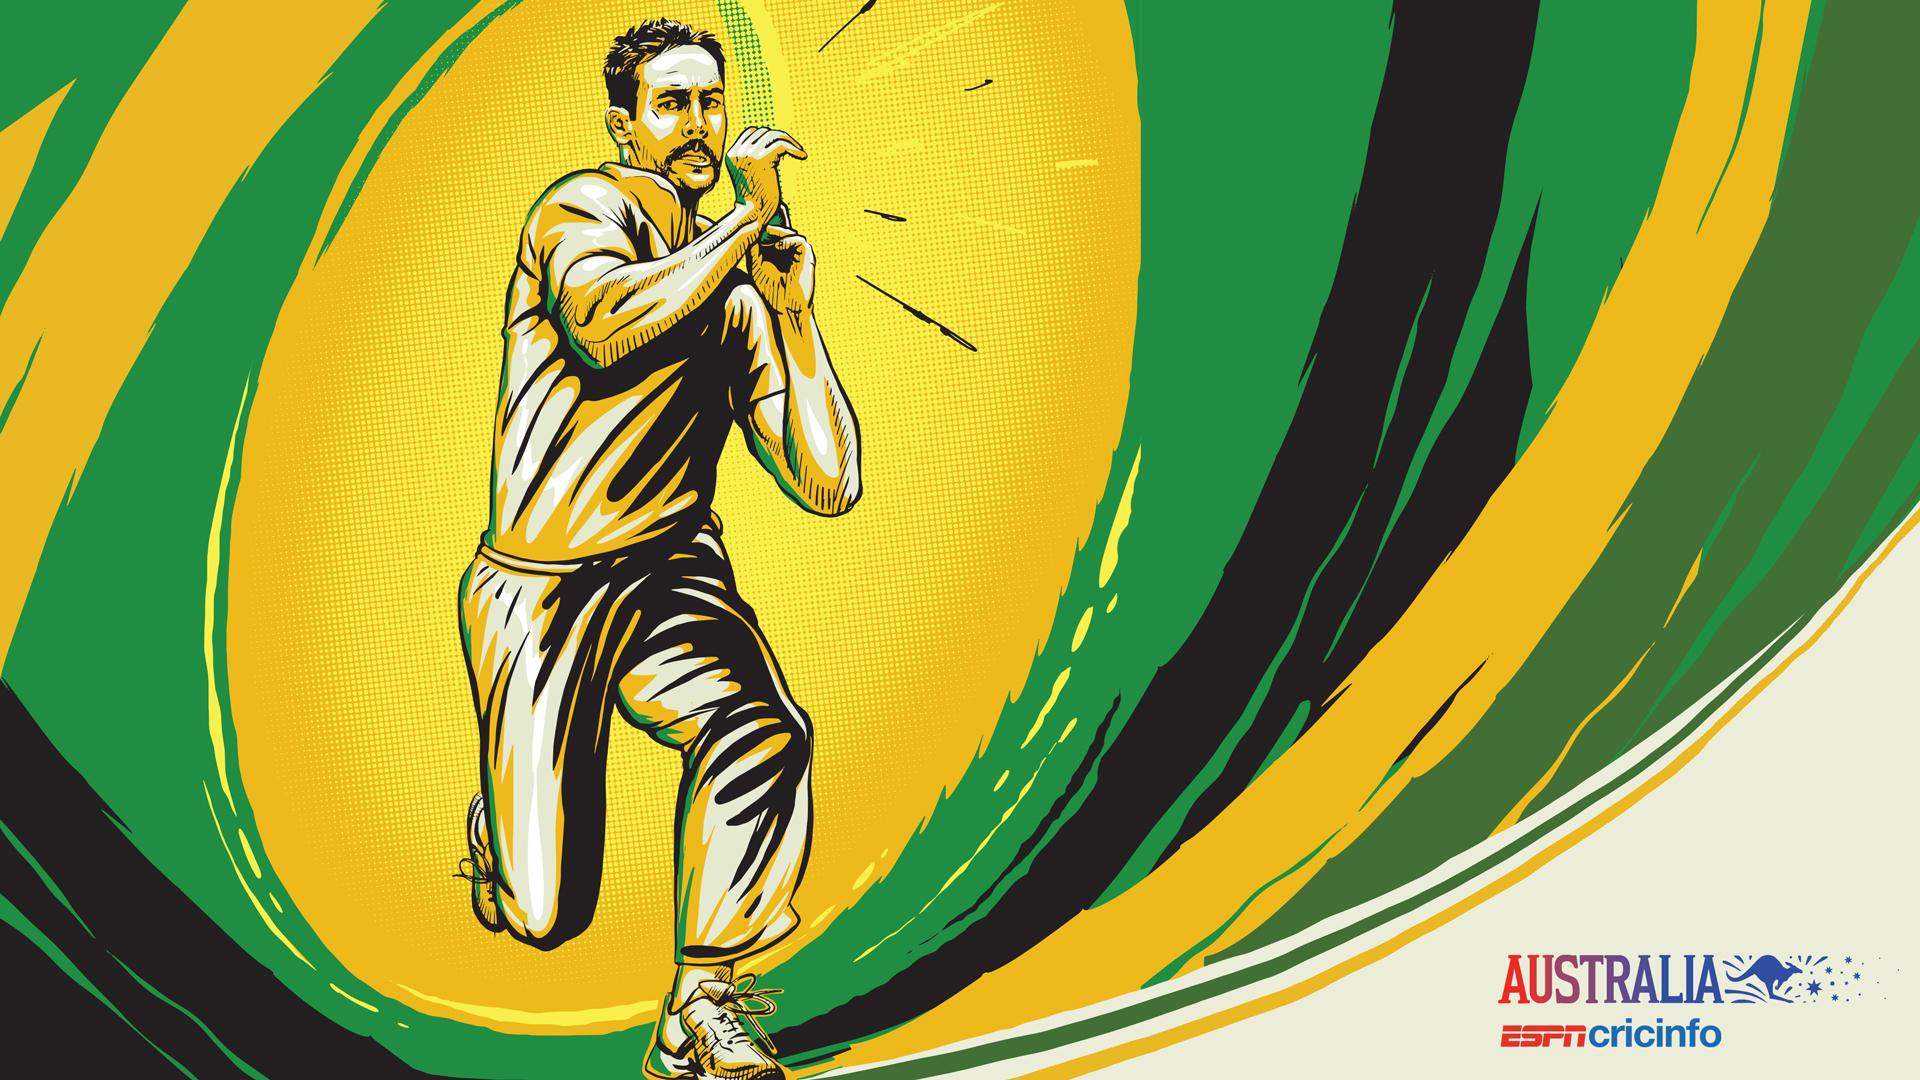 World Cup - Australia | Cricket